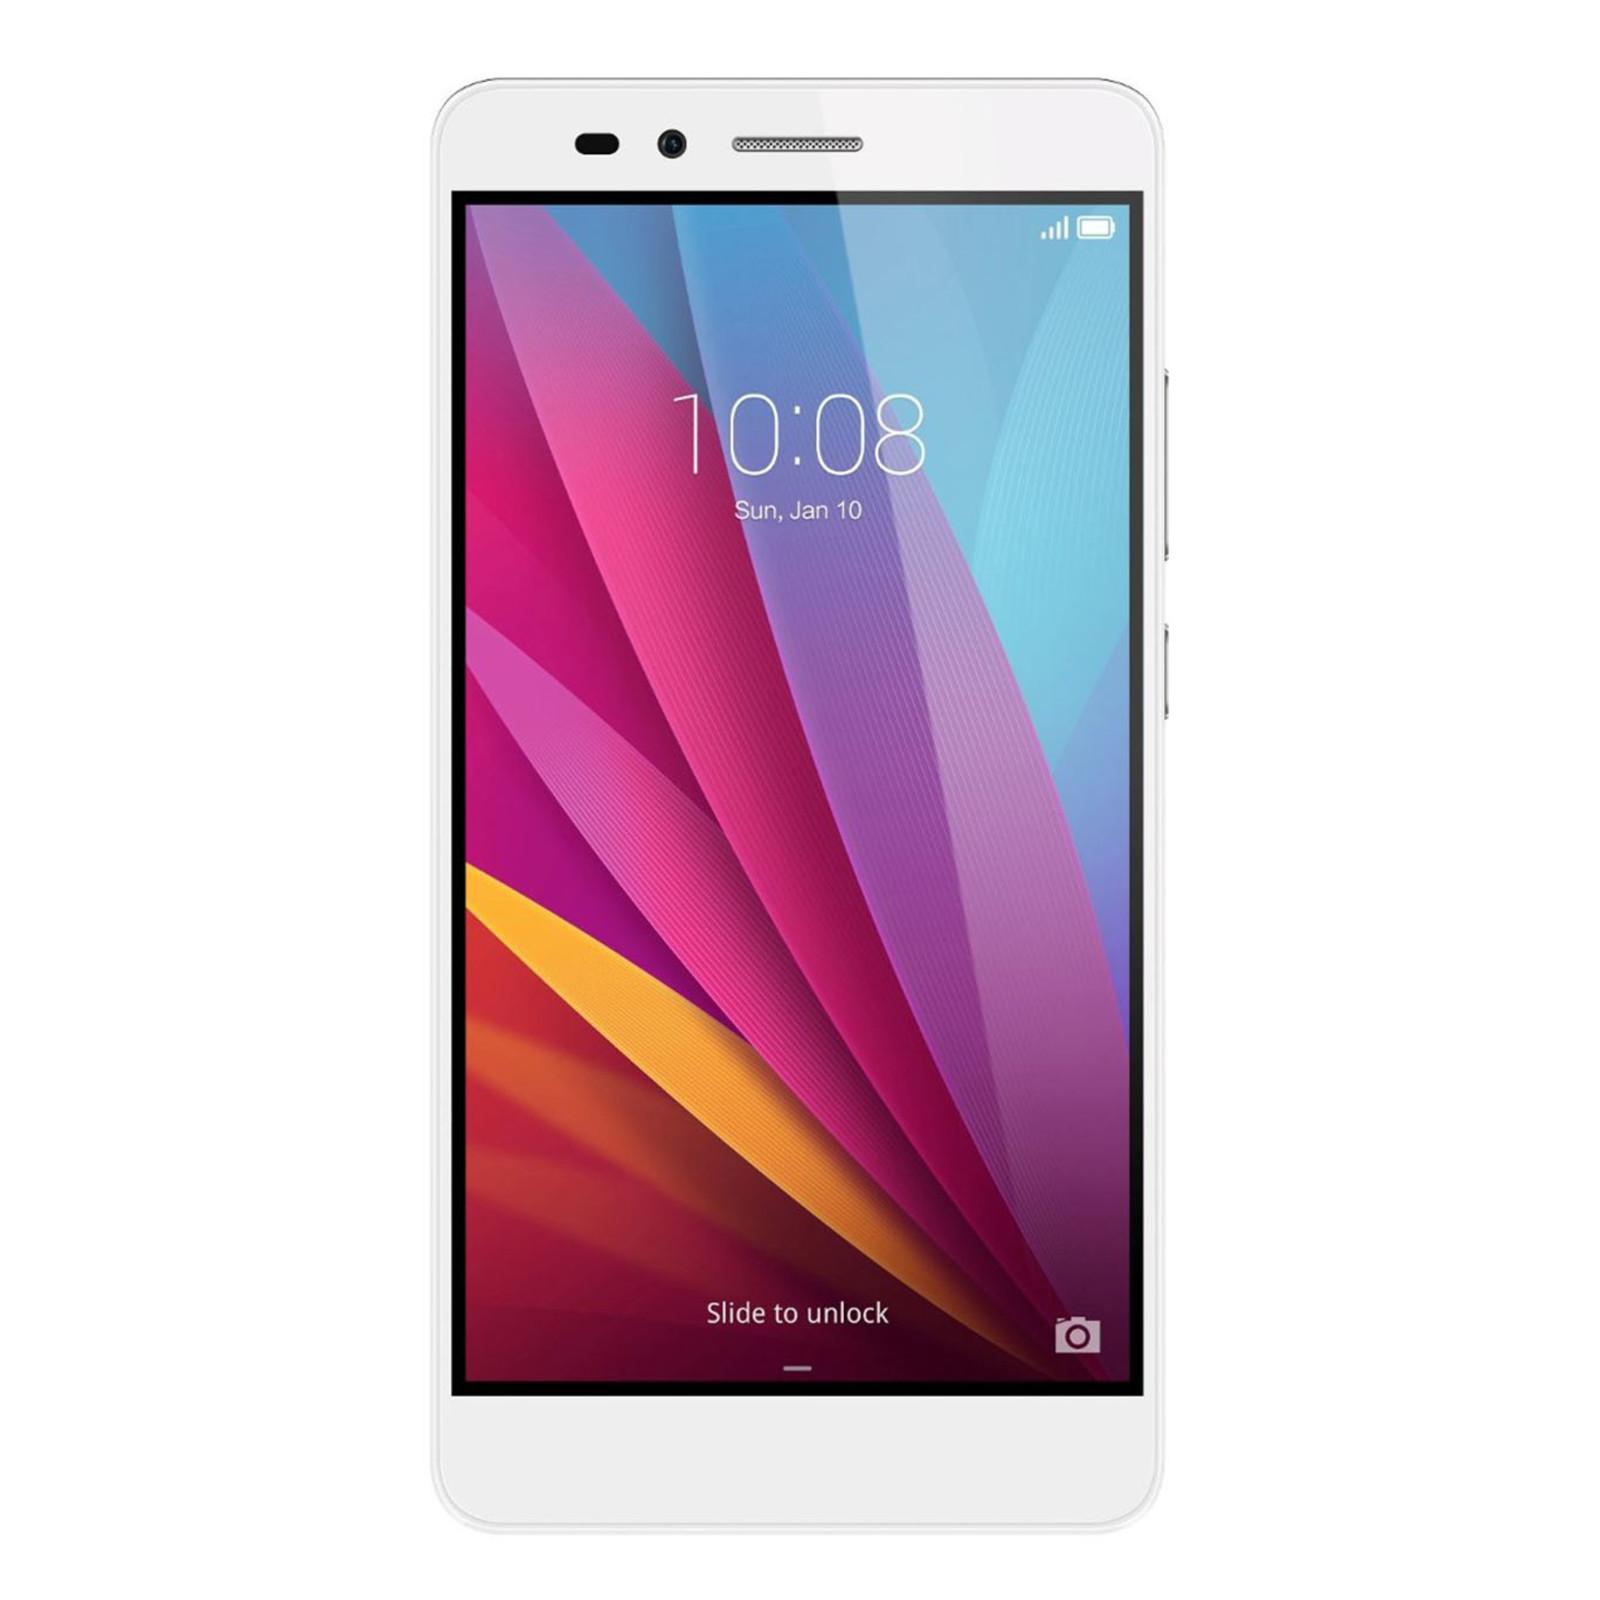 Huawei Honor 5X 16GB Unlocked GSM 4G LTE Octa-Core Phone ...